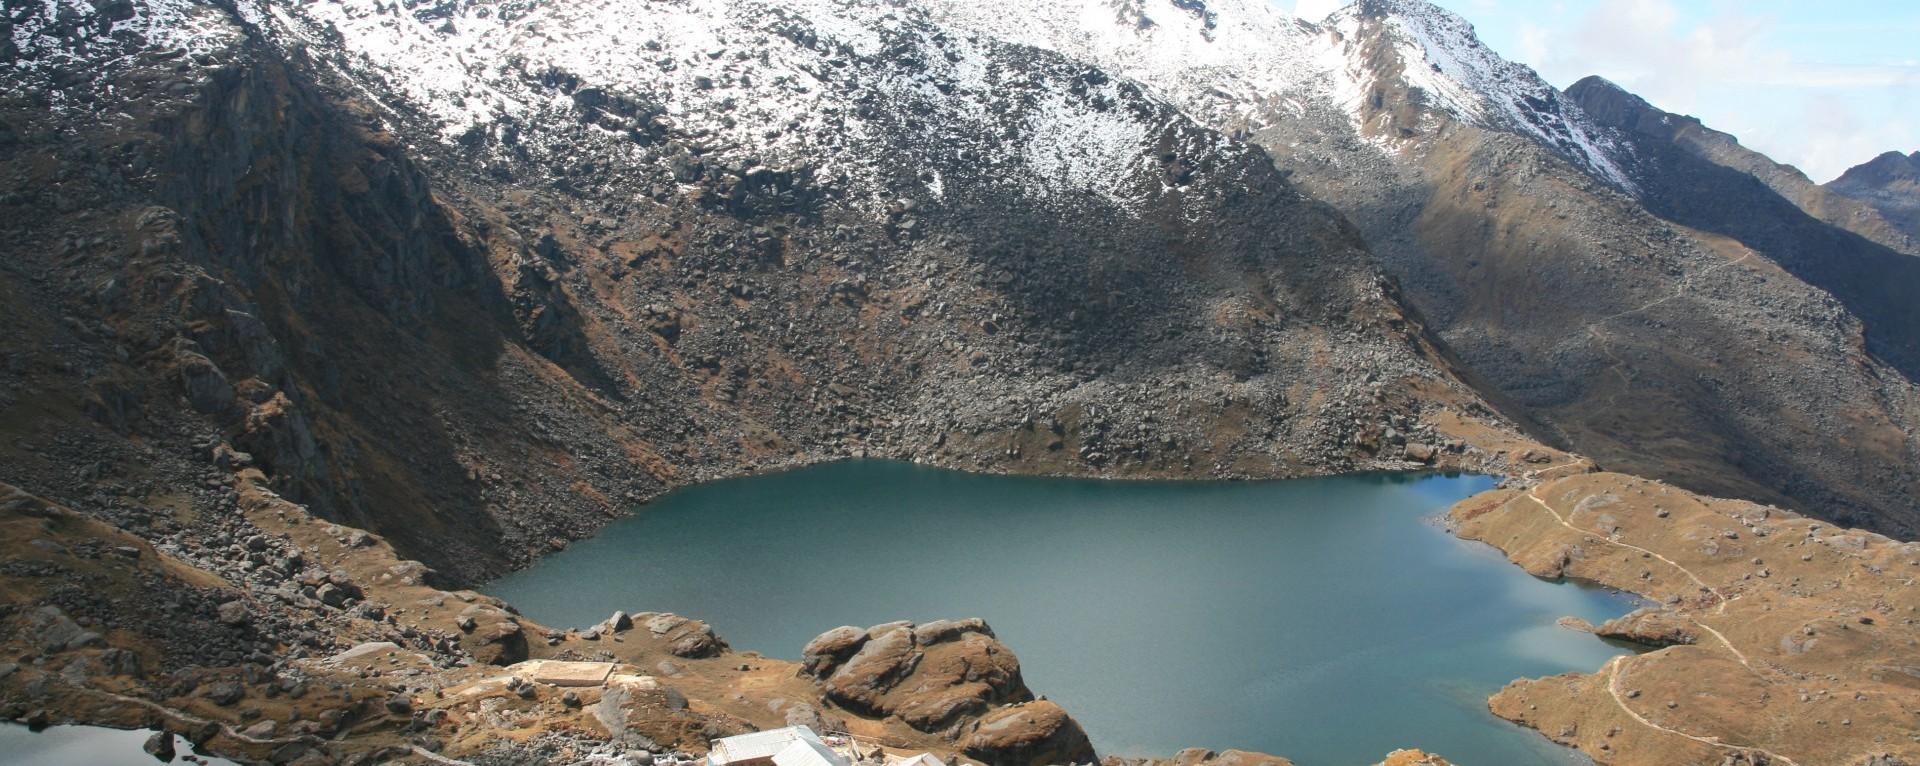 Ganja-La Pass Trekking-0